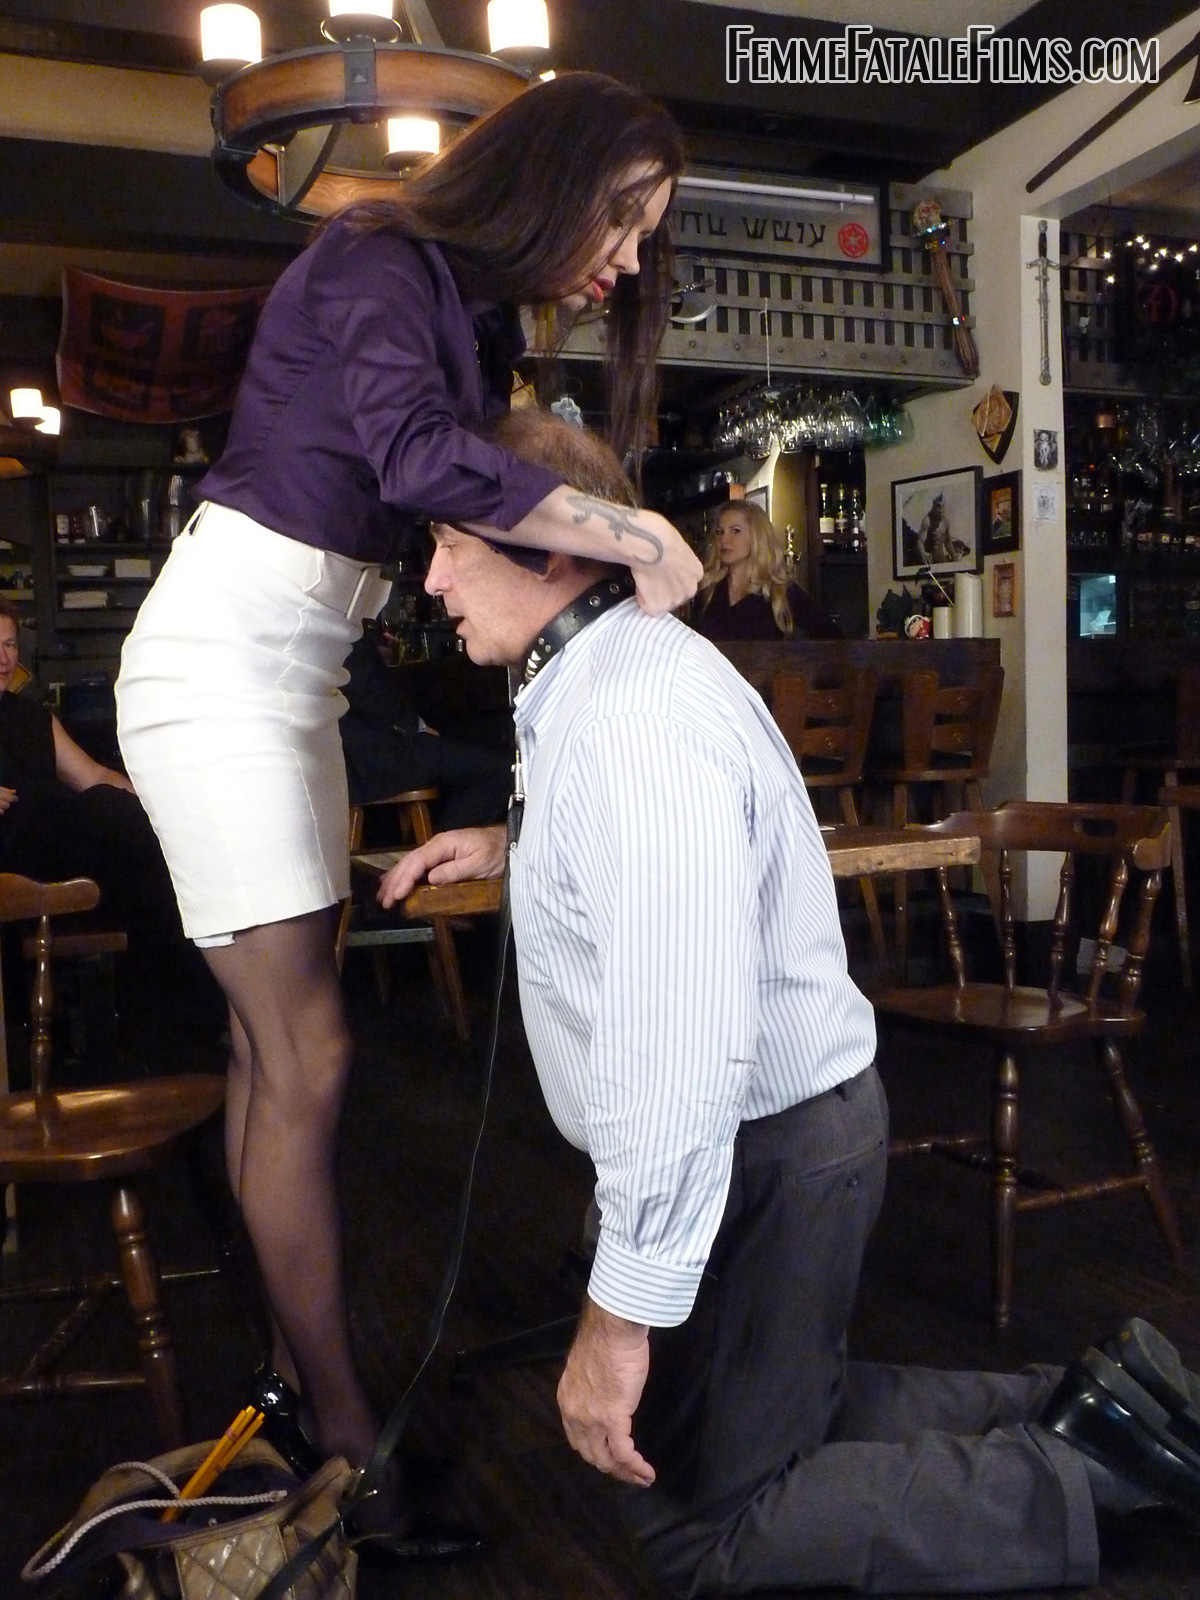 Femme Fatale Films  HD Femdom BDSM Domination Videos